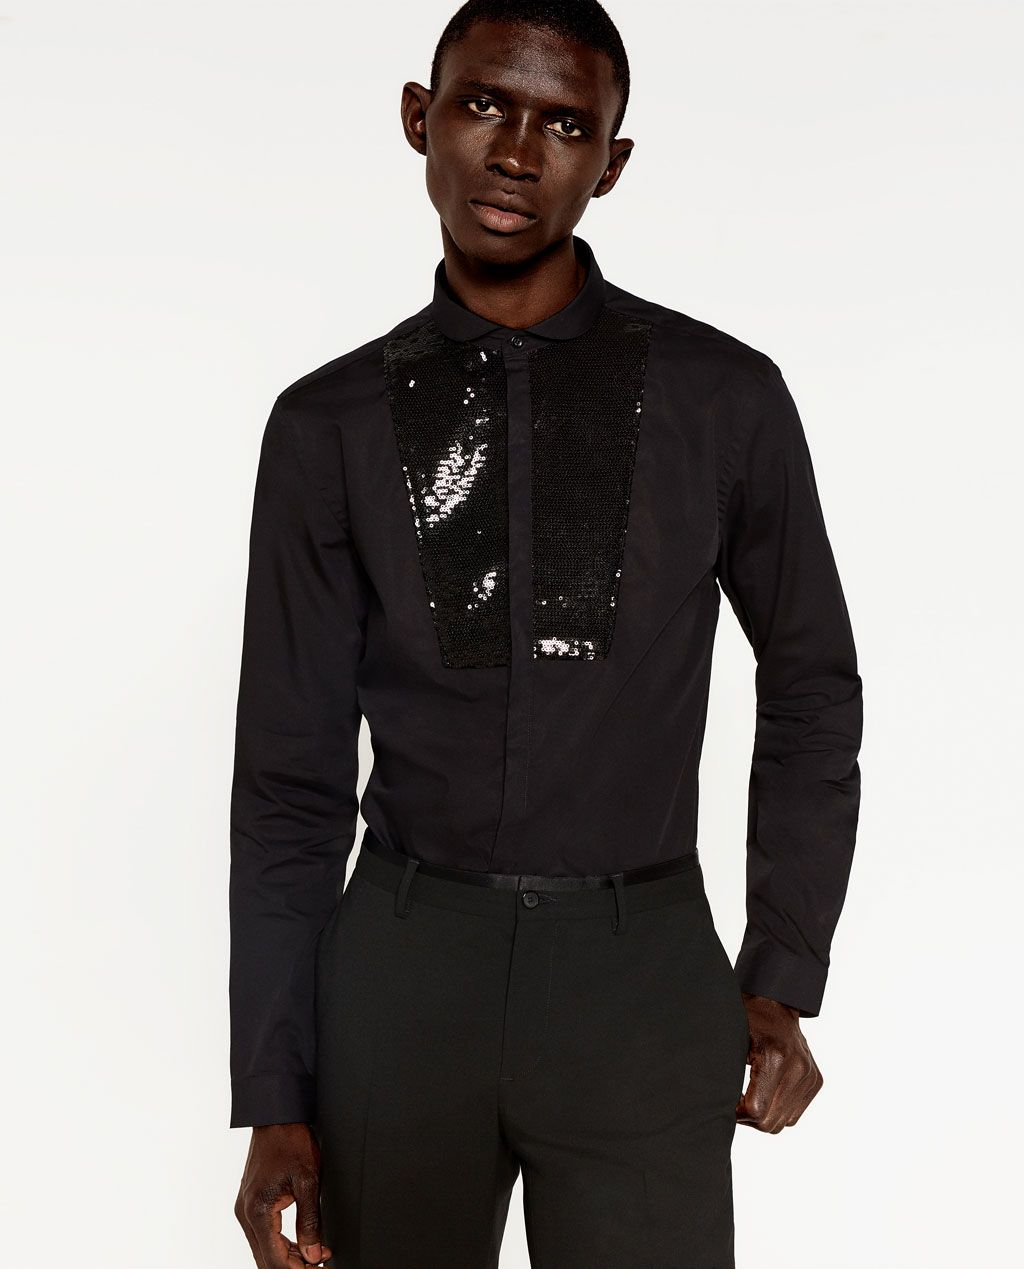 c5f68629 ZARA - MAN - SEQUIN SHIRT | Resort 17 | Sequin shirt, Zara man ...